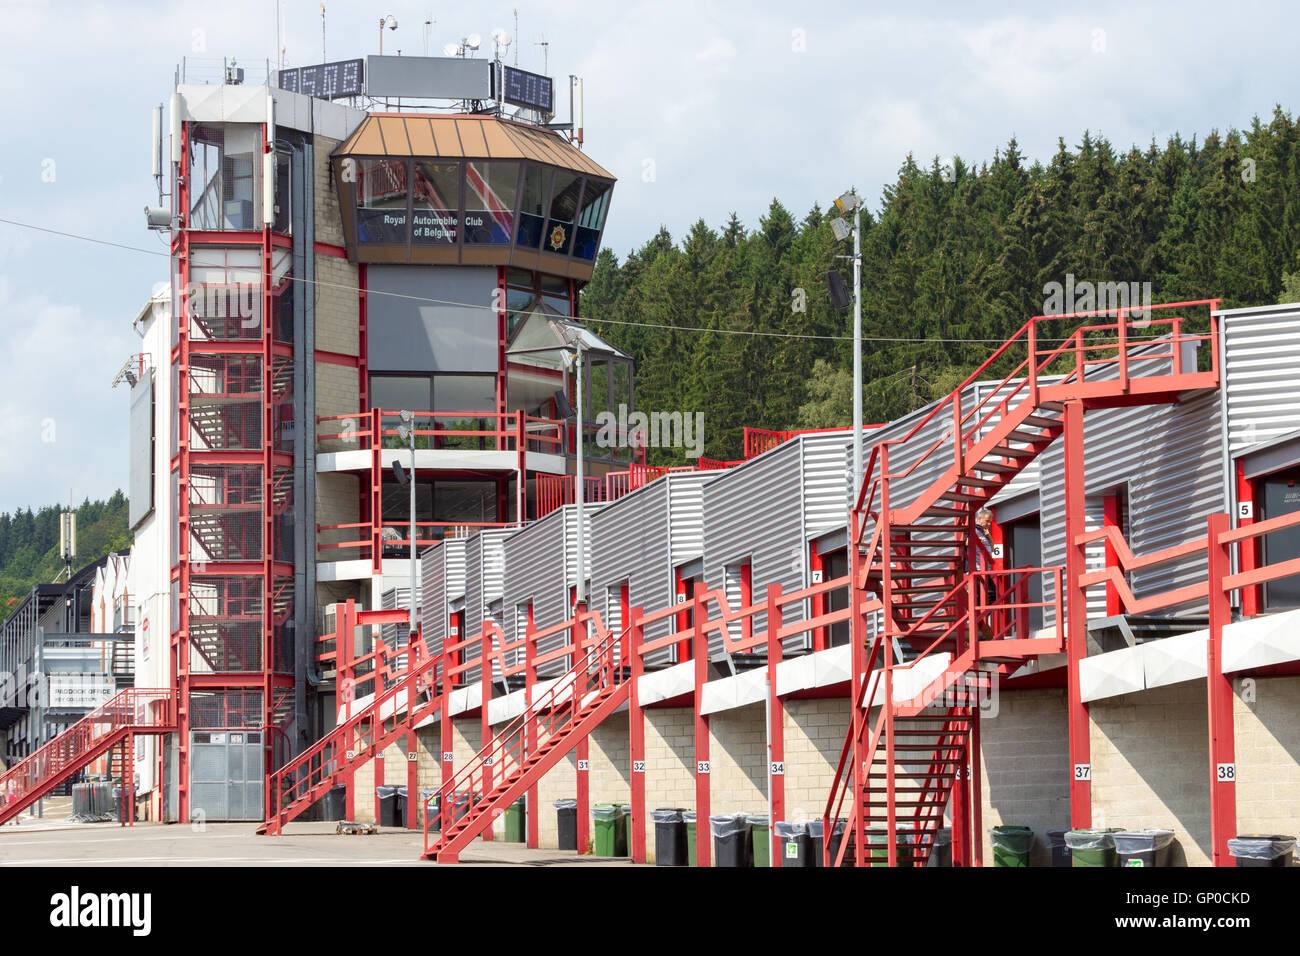 Kontrollturm der Rennstrecke Spa-Francorchamps Stockbild